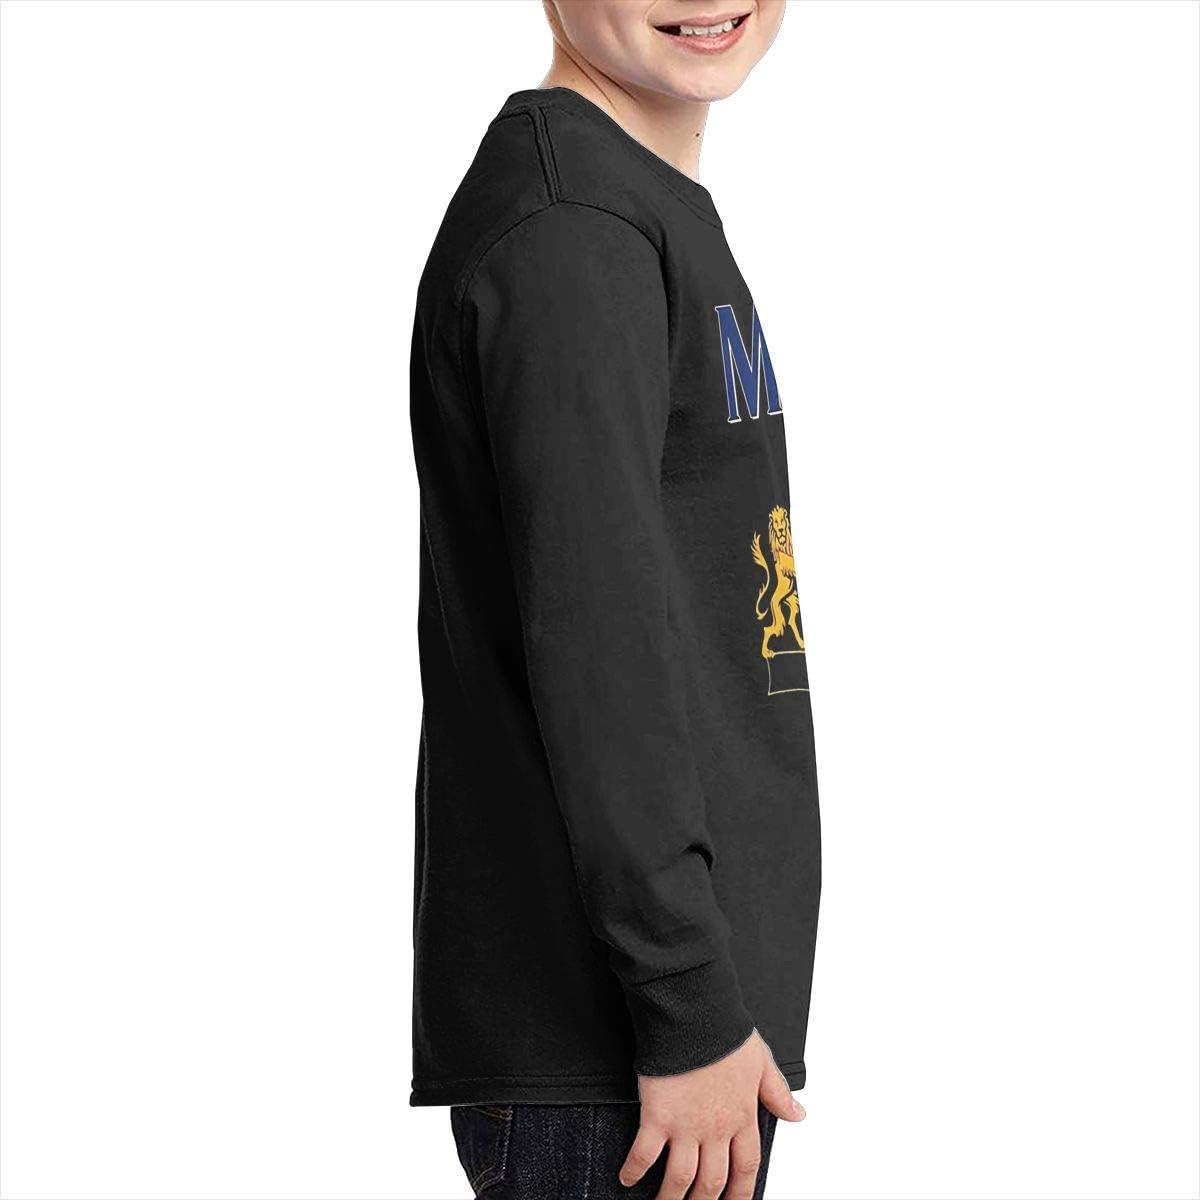 WillardSCox Youth Boys Girls Modelo Especial Cerveza Casual Cool Junior Long Sleeve T-Shirt Black